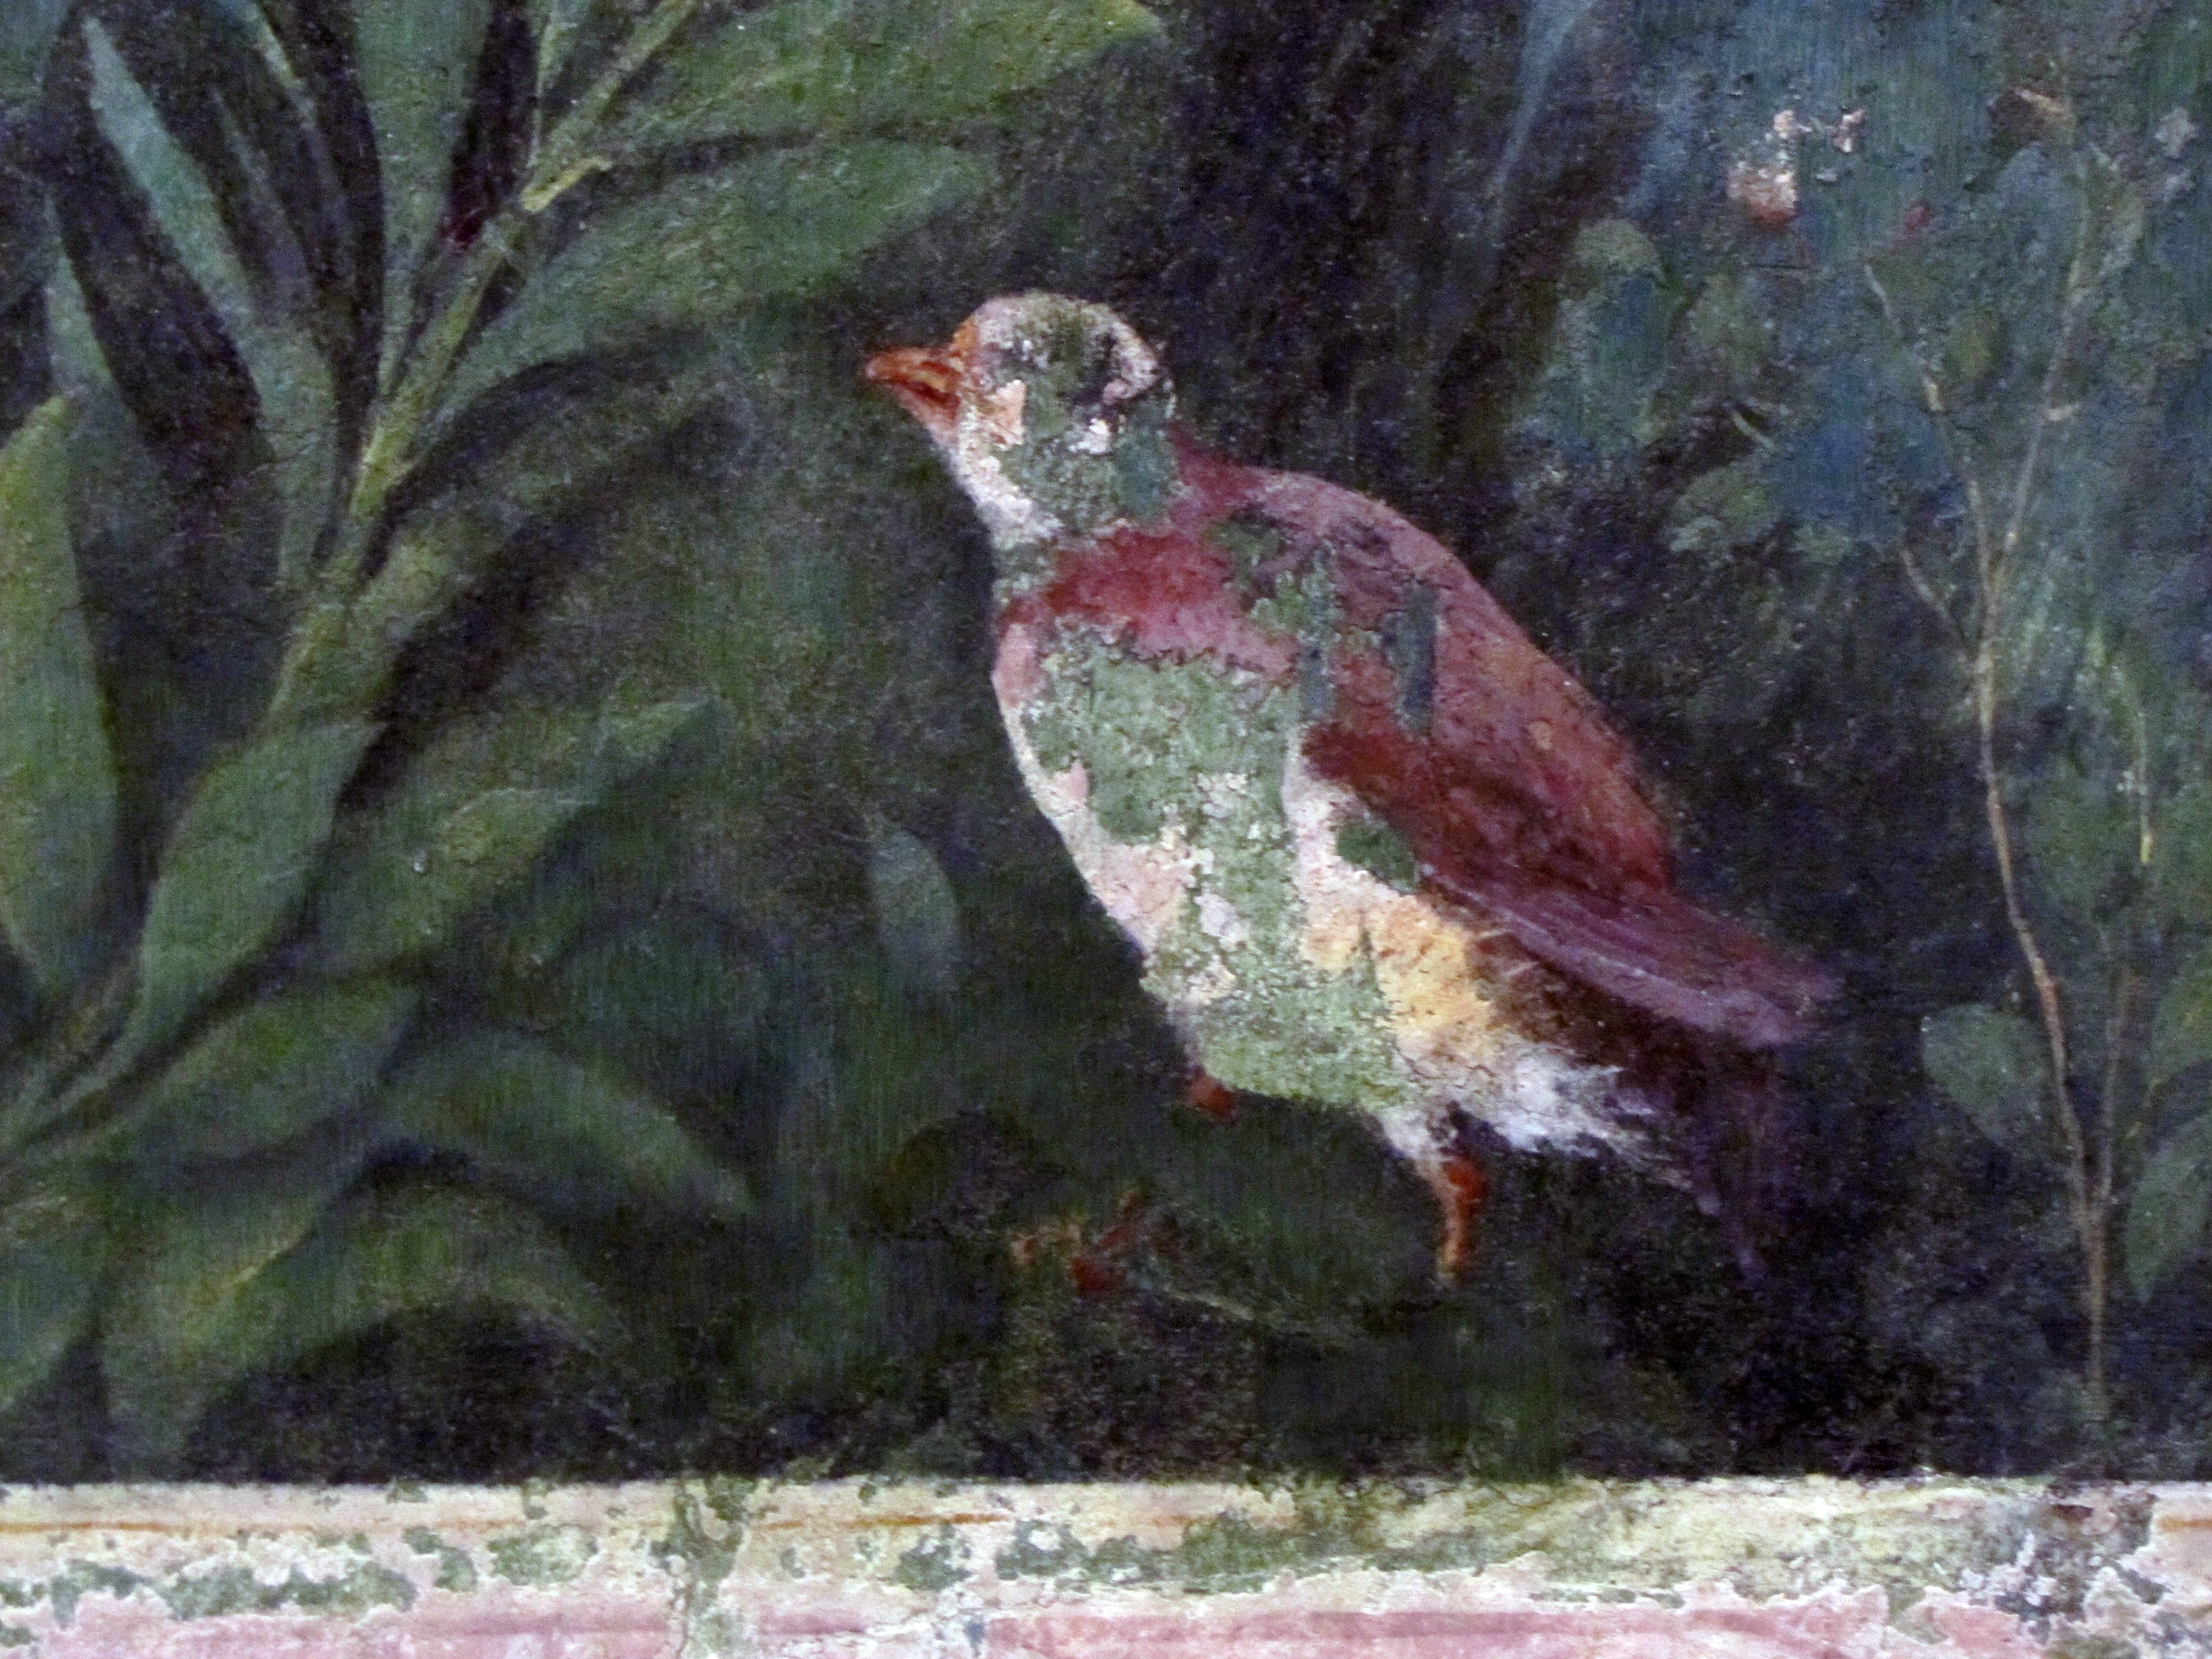 Partridge/Pheasant